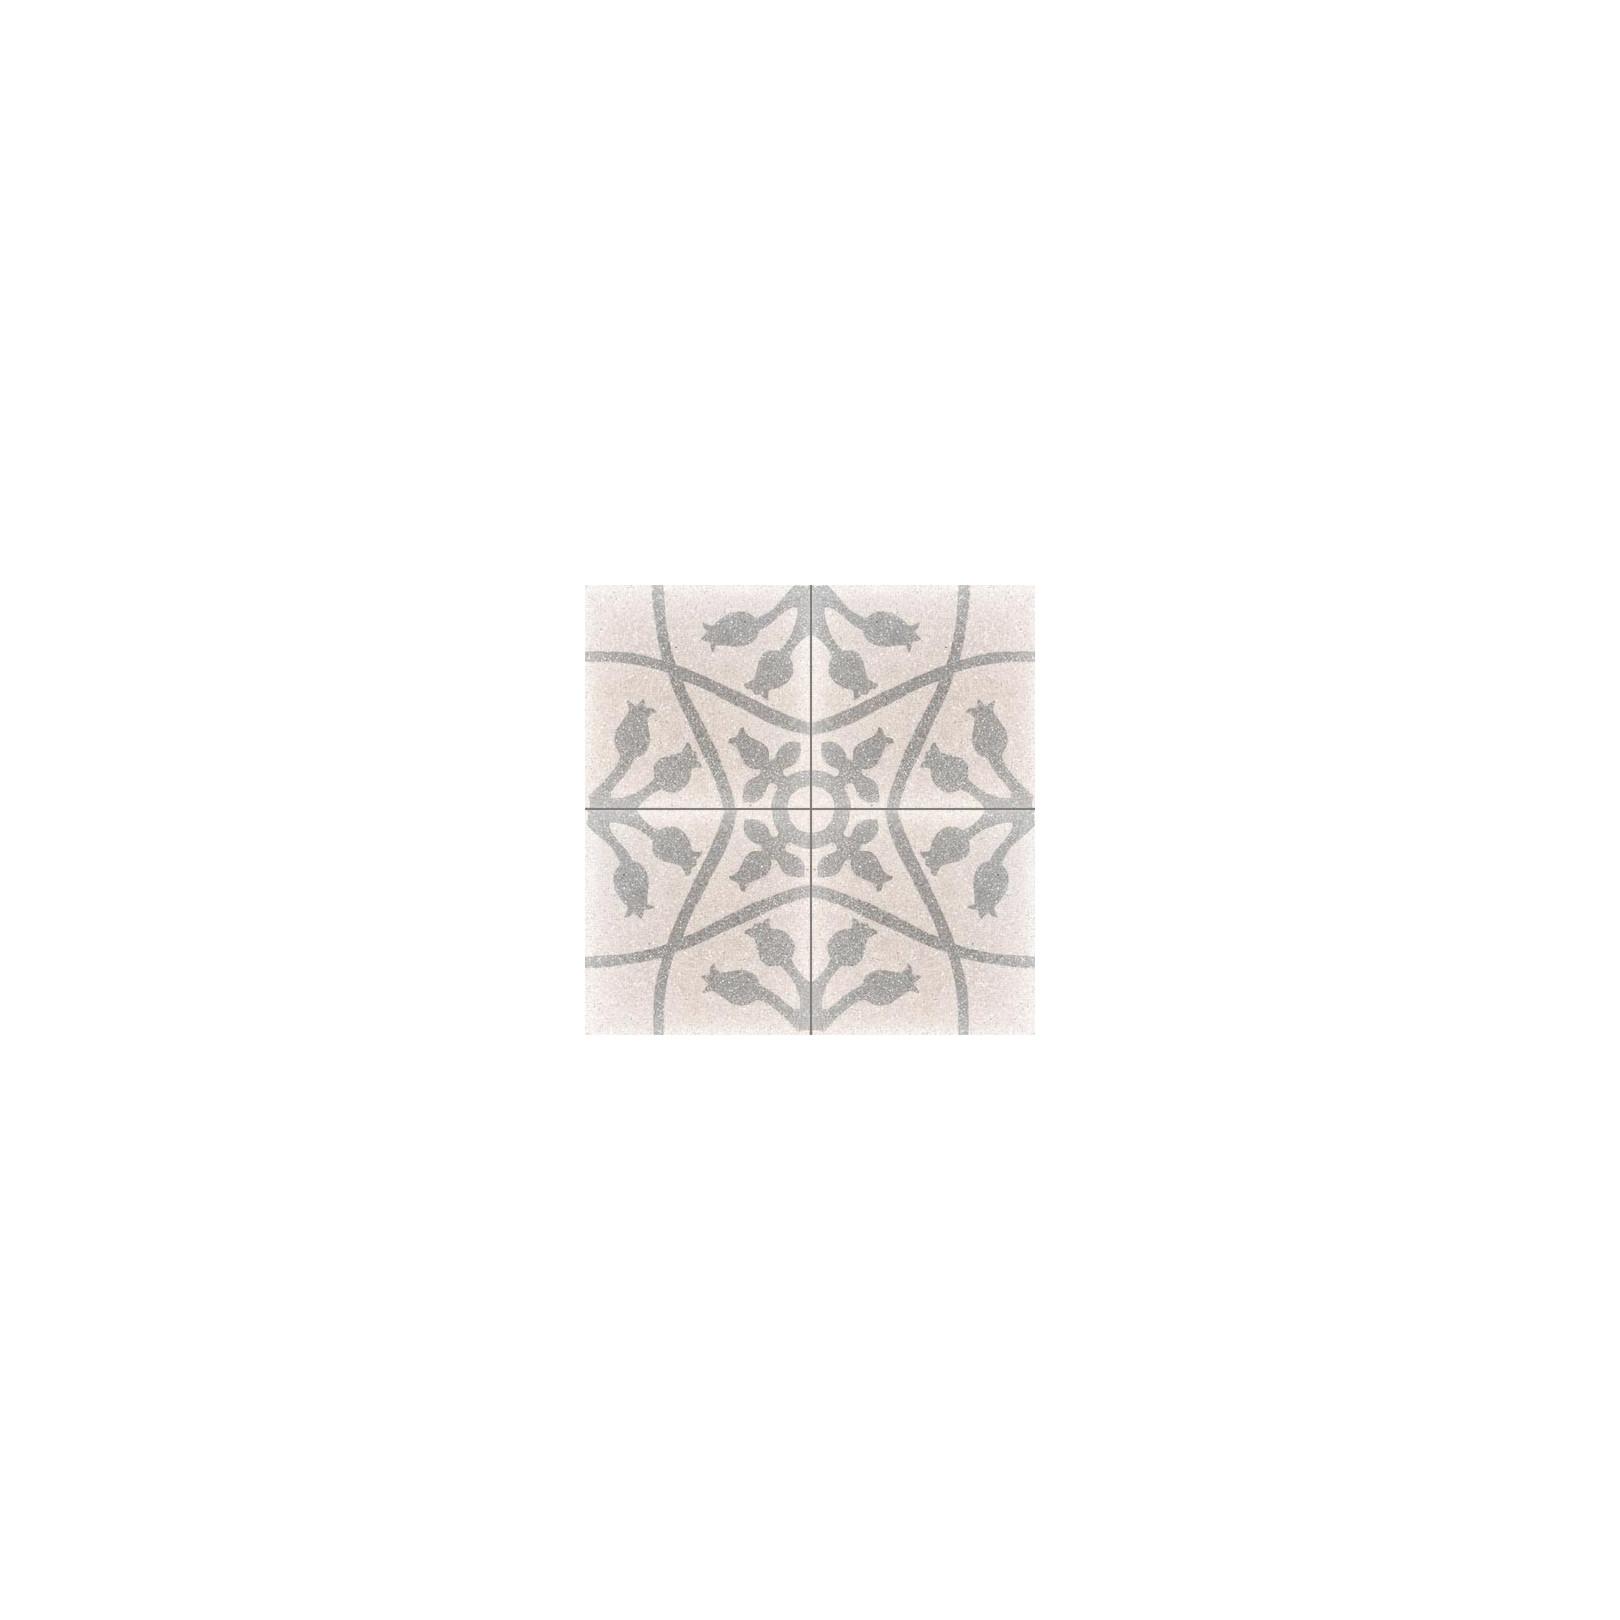 Carreau de terrazzo motif 4 carreaux crème Nina B TU 07.27